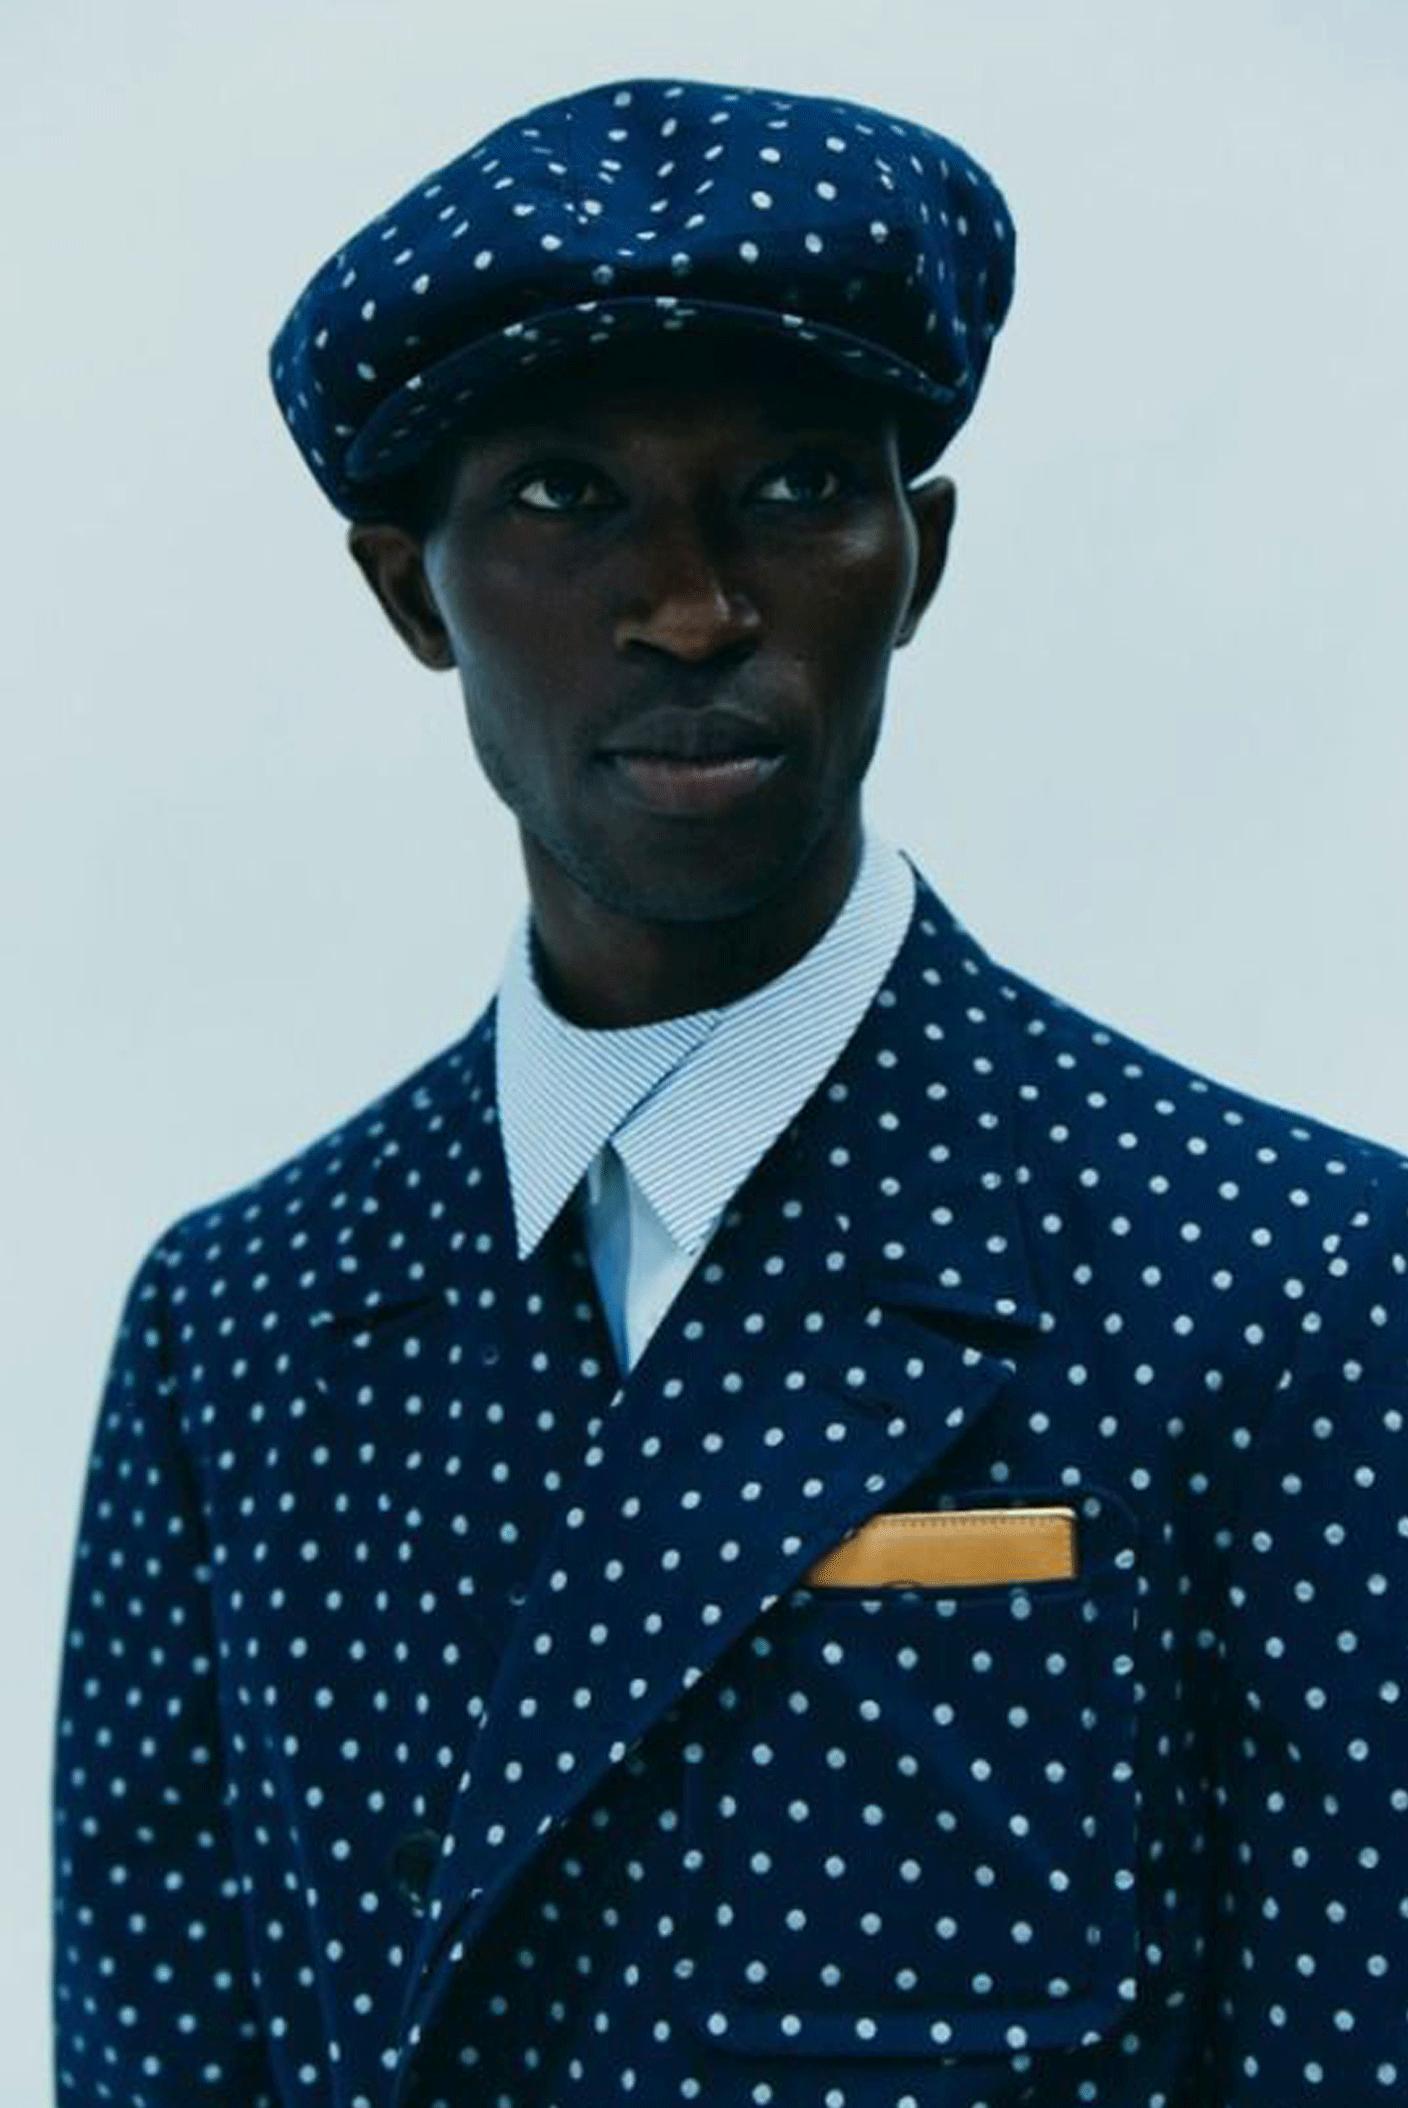 polka dot suit | @themissprints